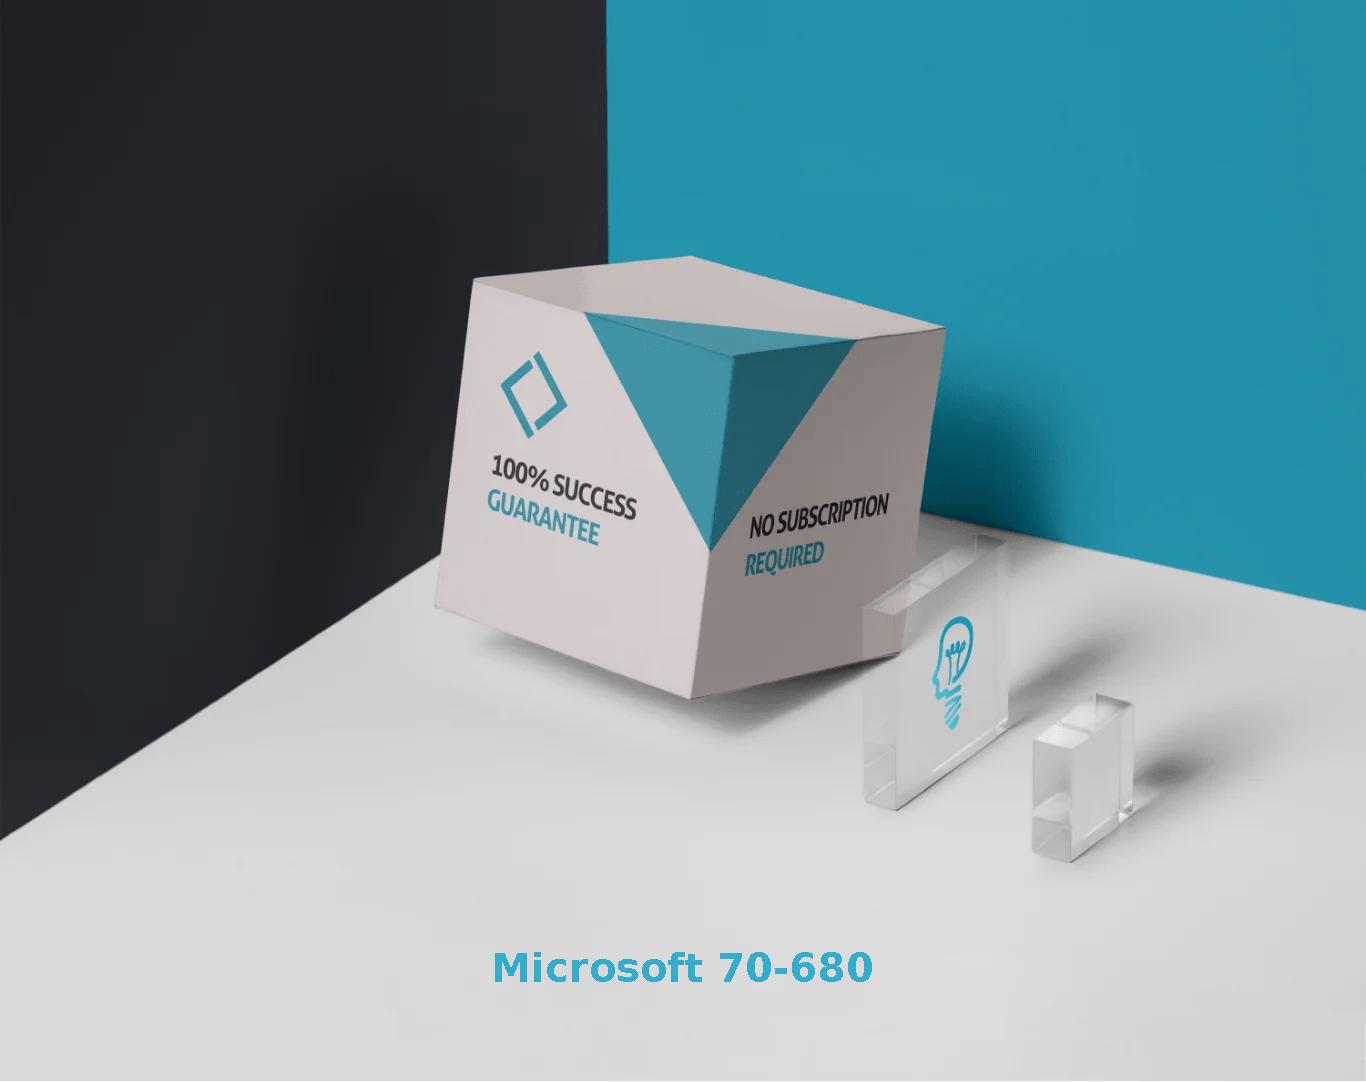 Microsoft 70-680 Exams